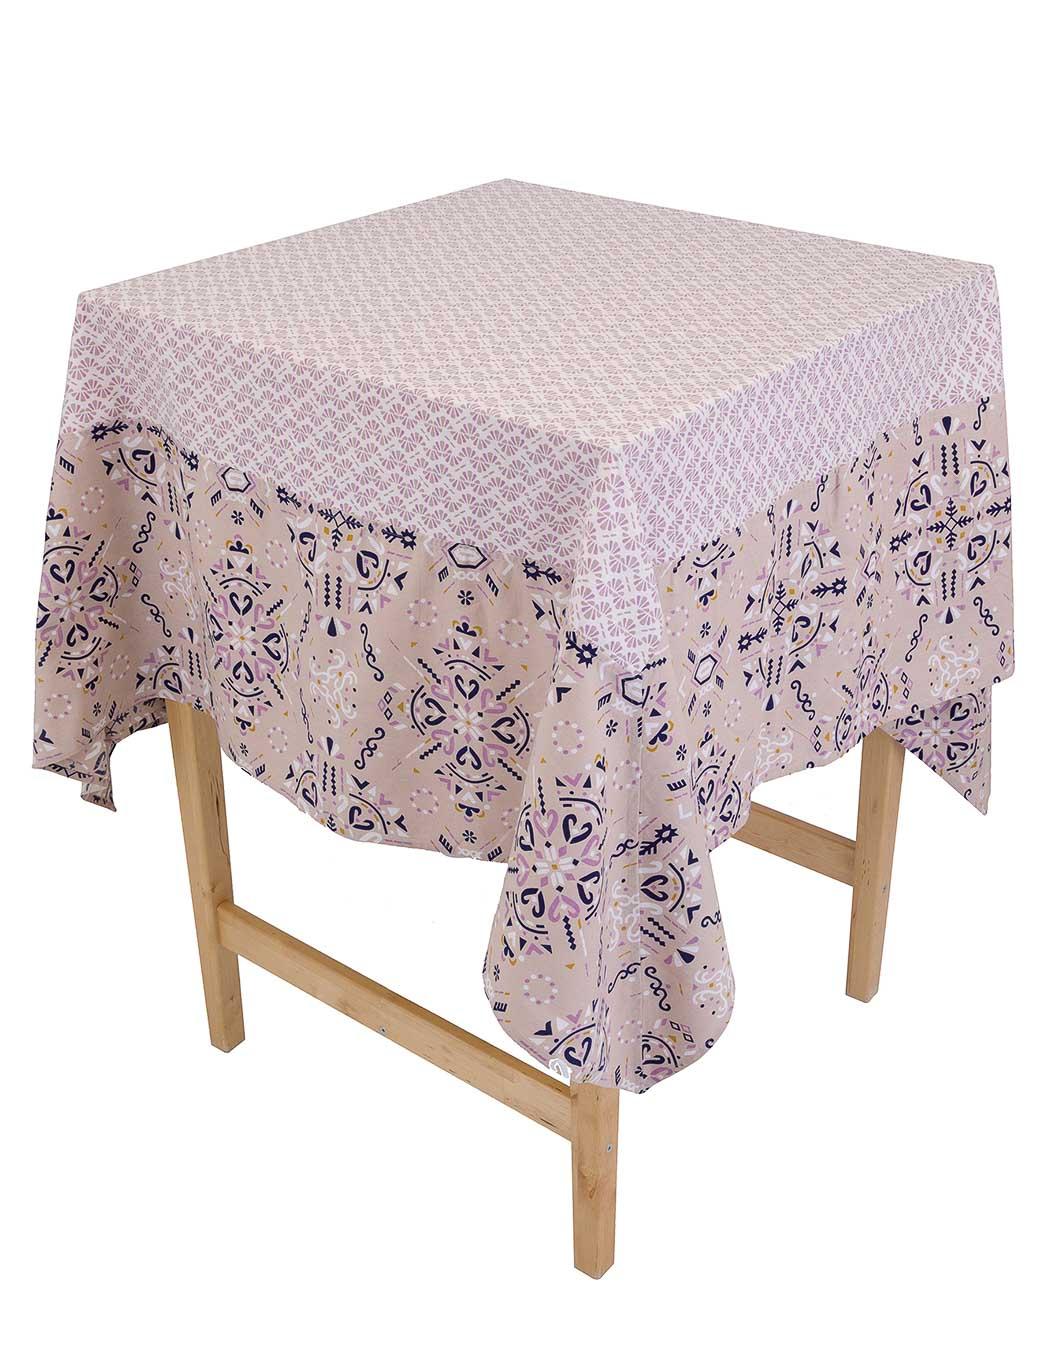 Nappe biprint en coton gres 170 x 250